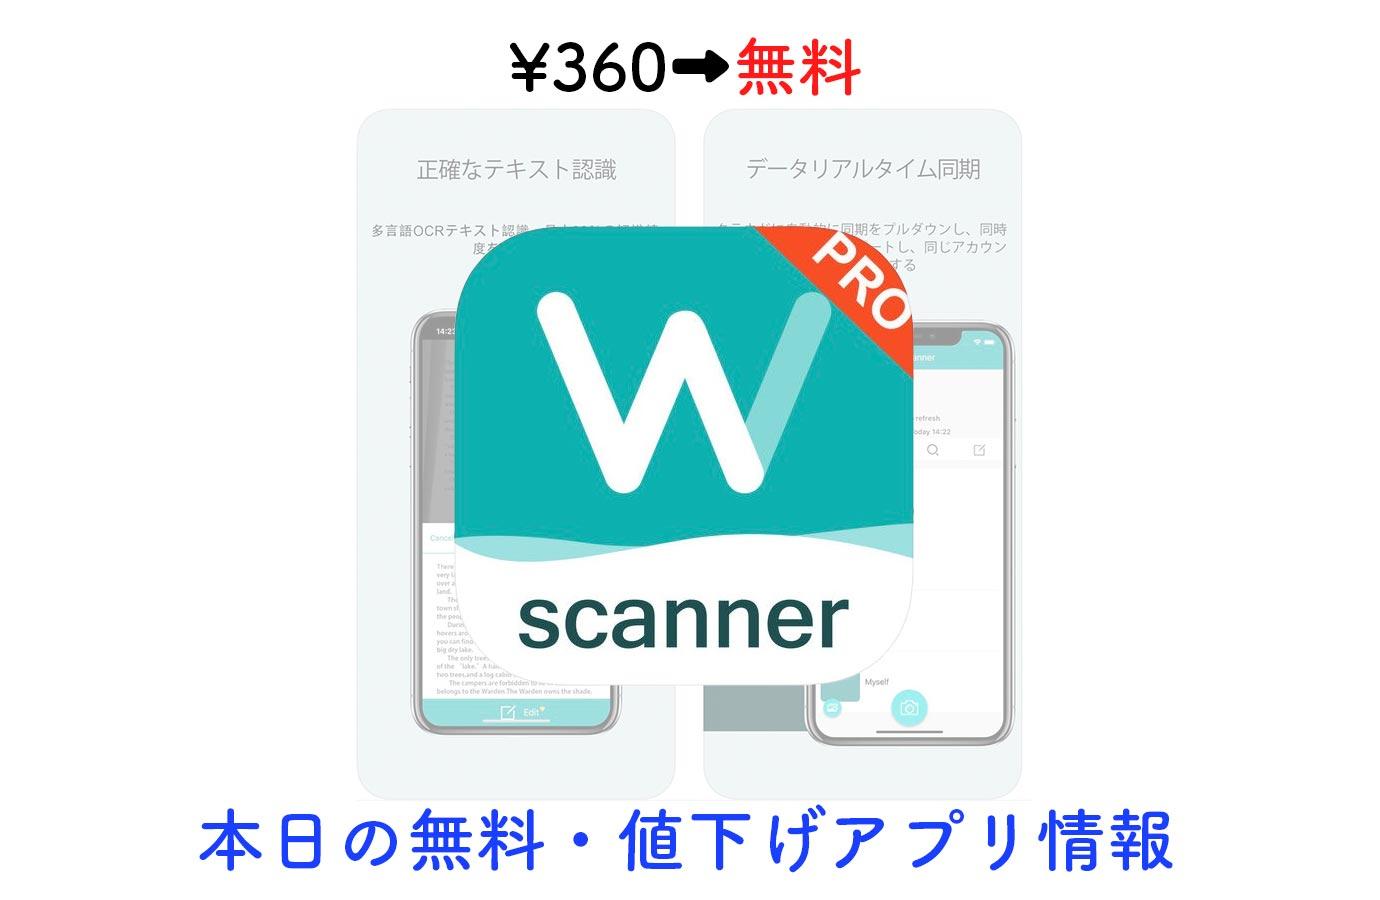 Appsale0605